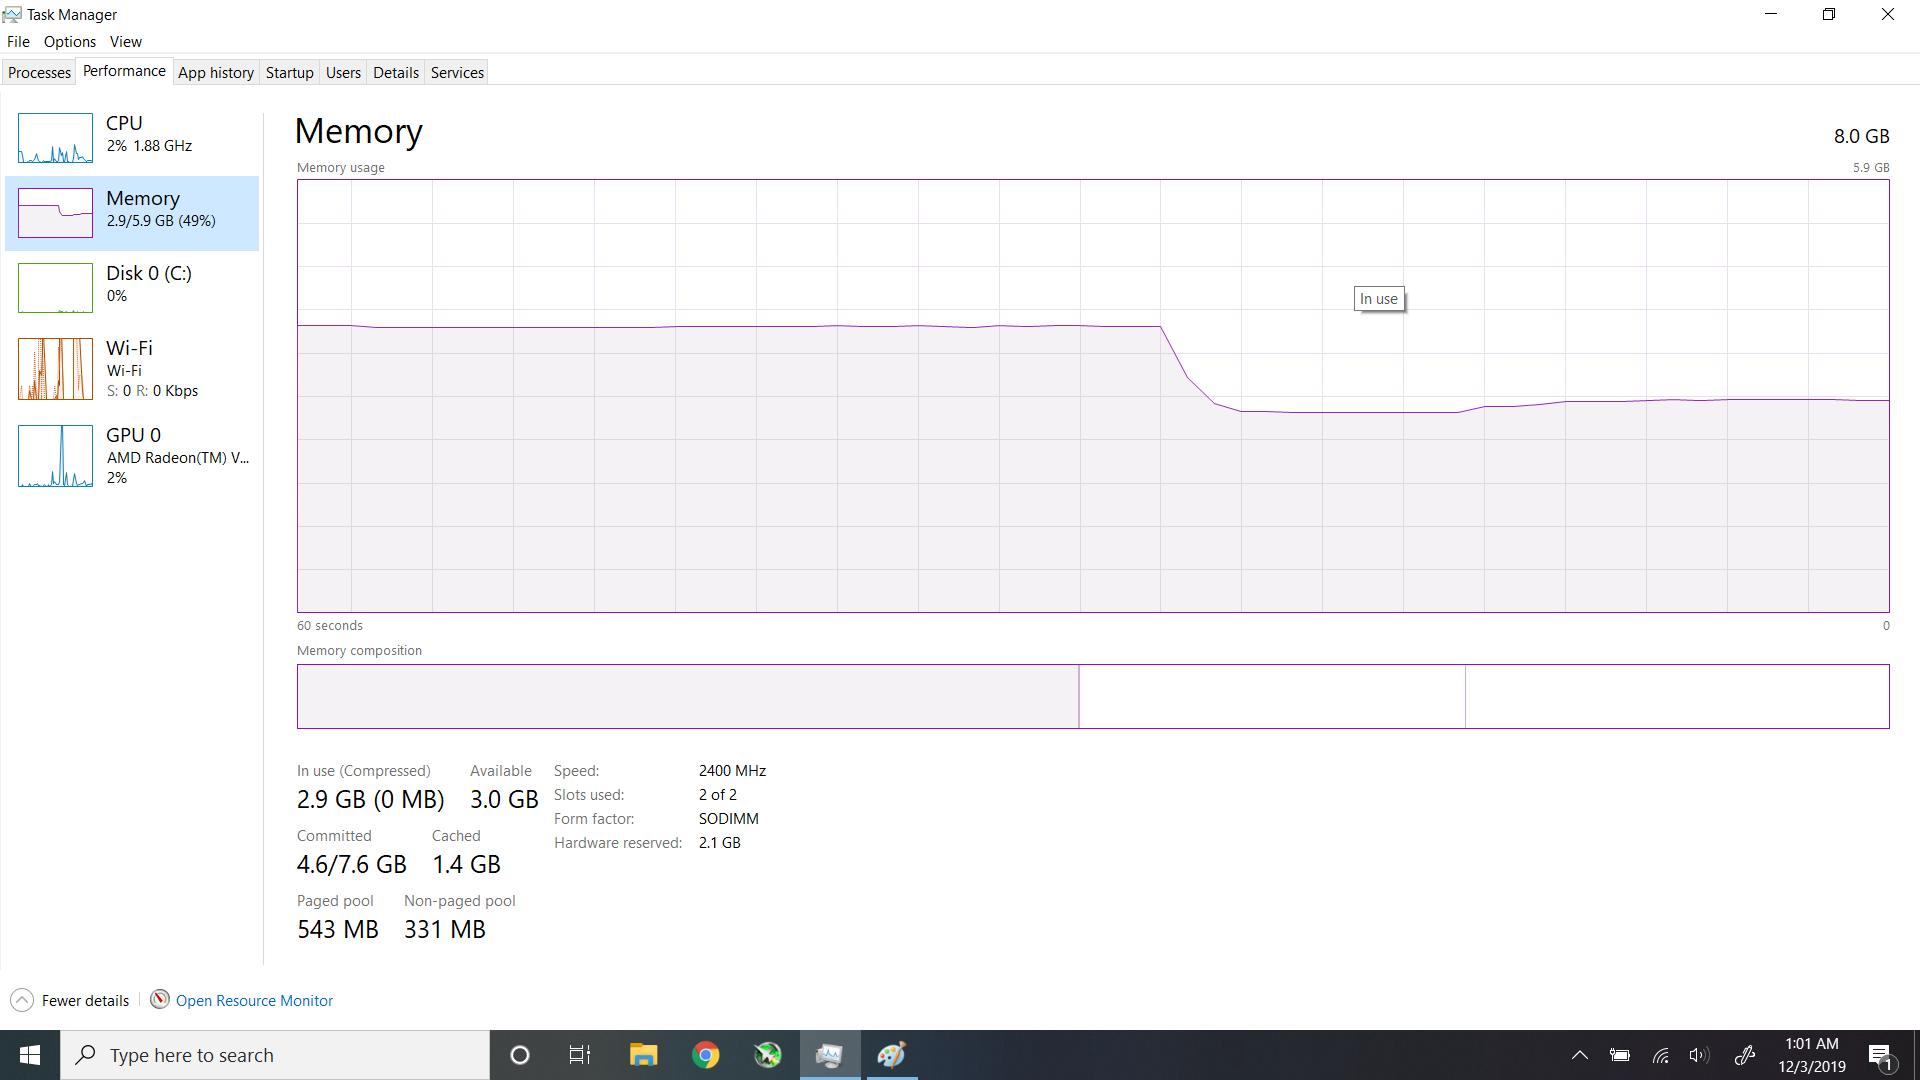 Unnatural RAM usage 5977386b-df76-455c-a9fd-f650aa5dcc8c?upload=true.png